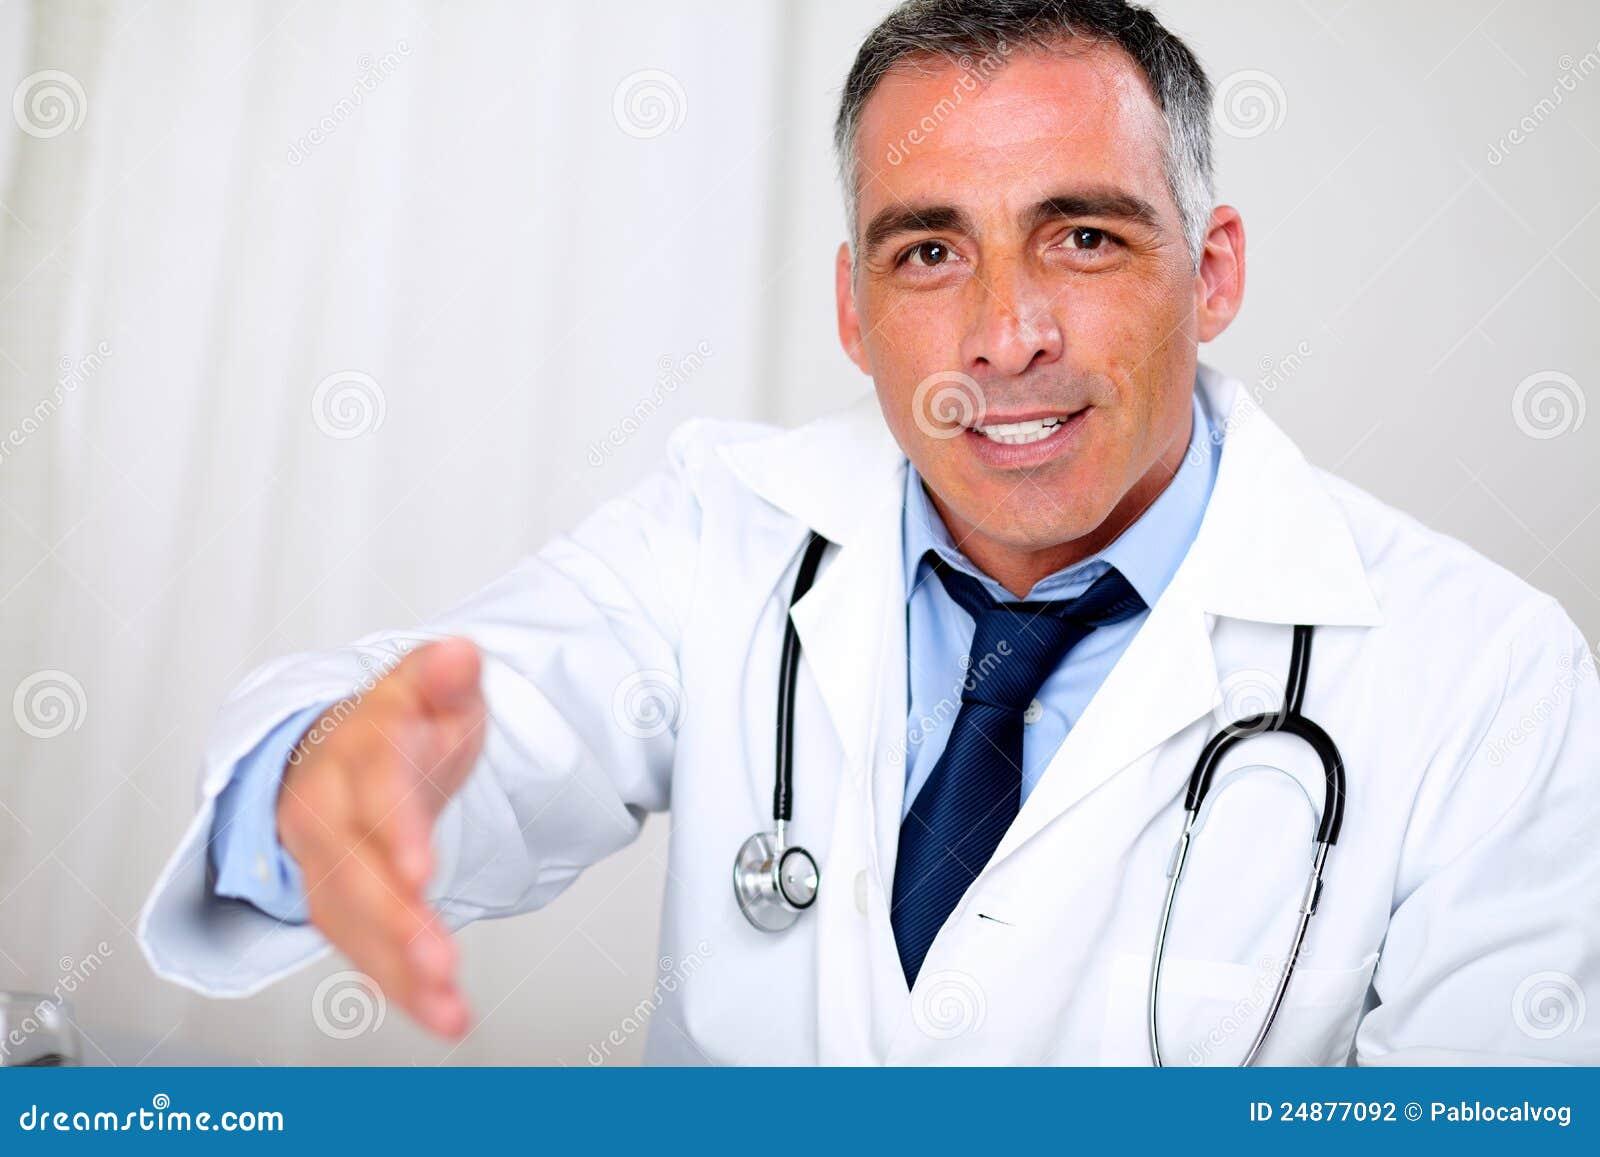 hispanic doctor